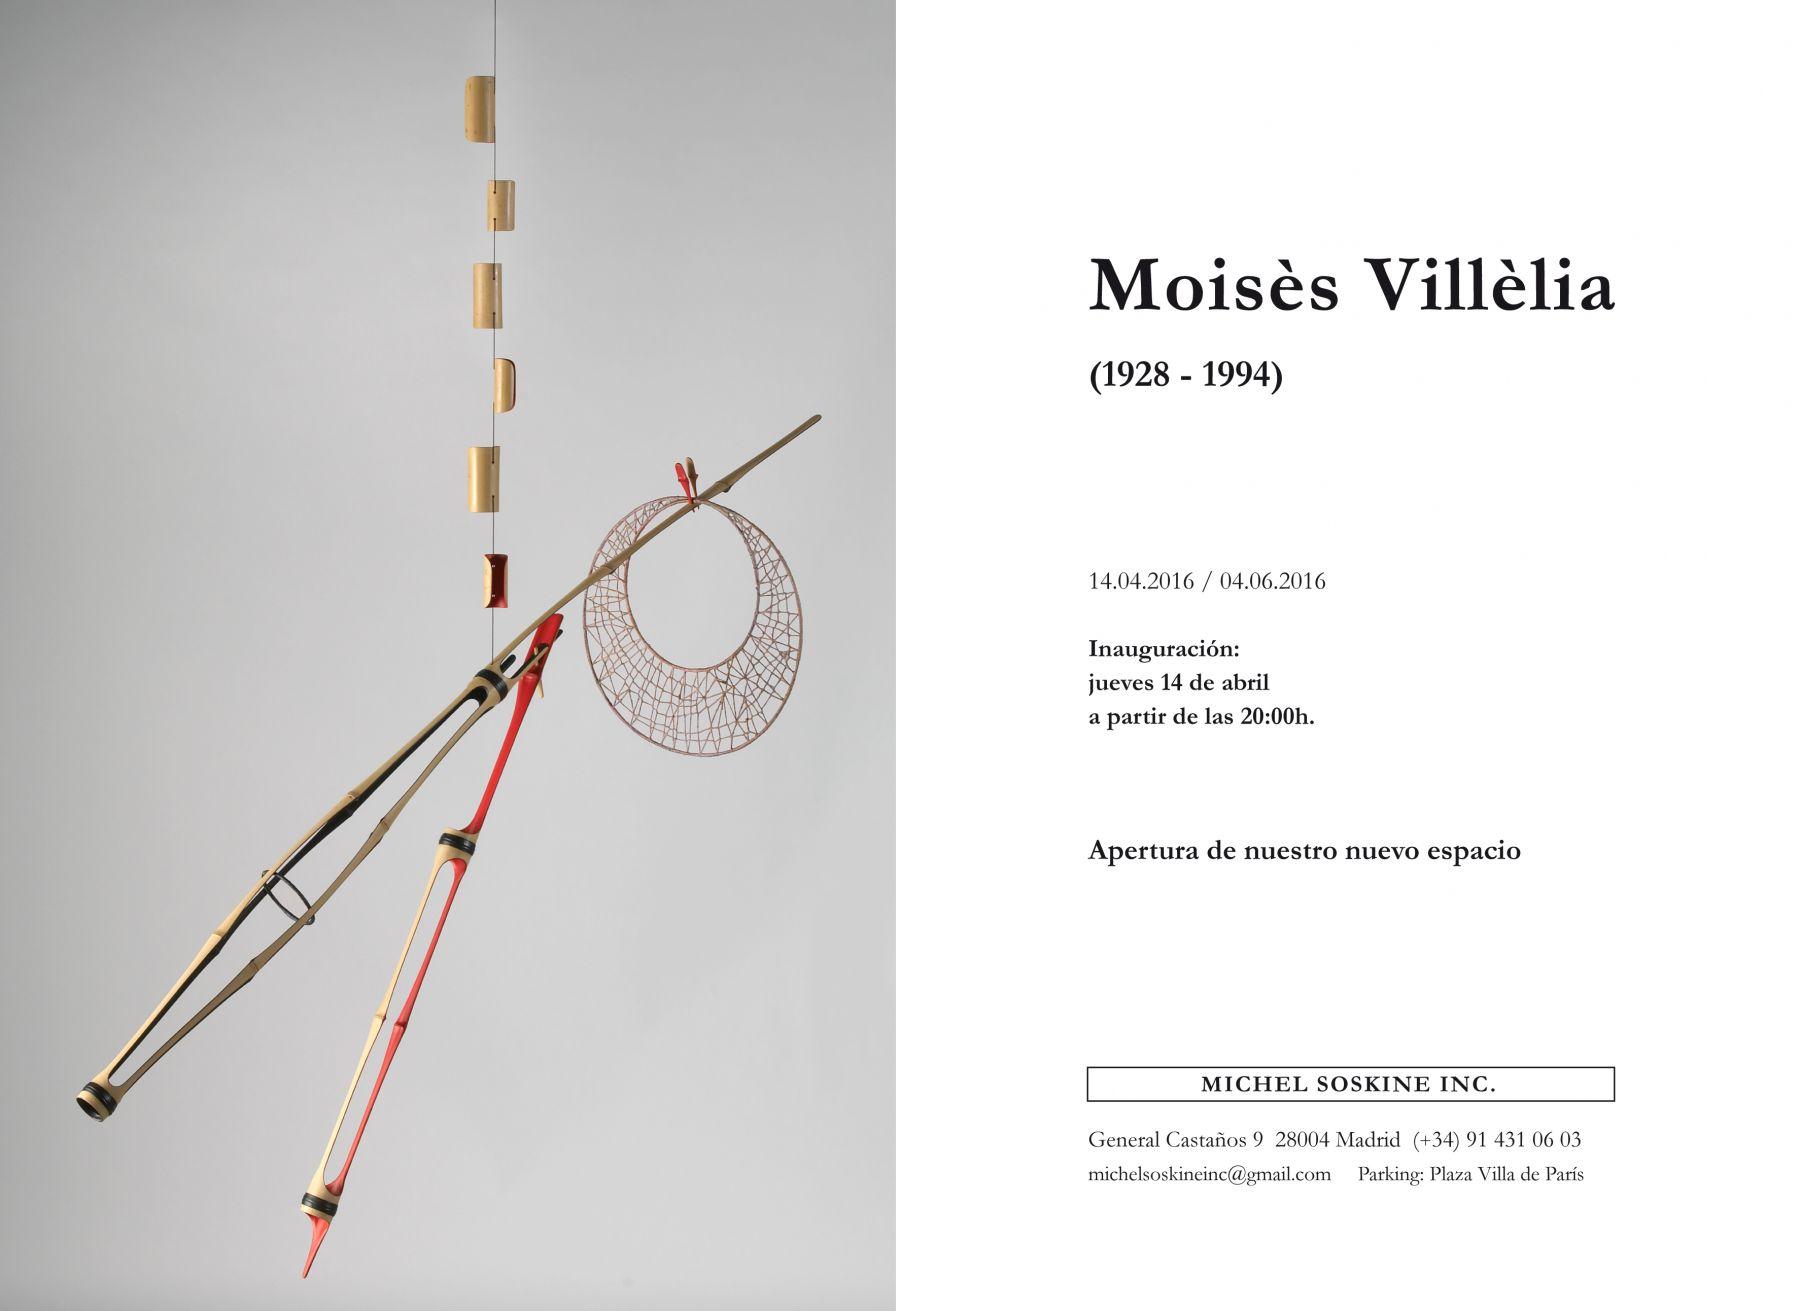 MOISÈS VILLÈLIA (1928 - 1994), Bamboo sculptures